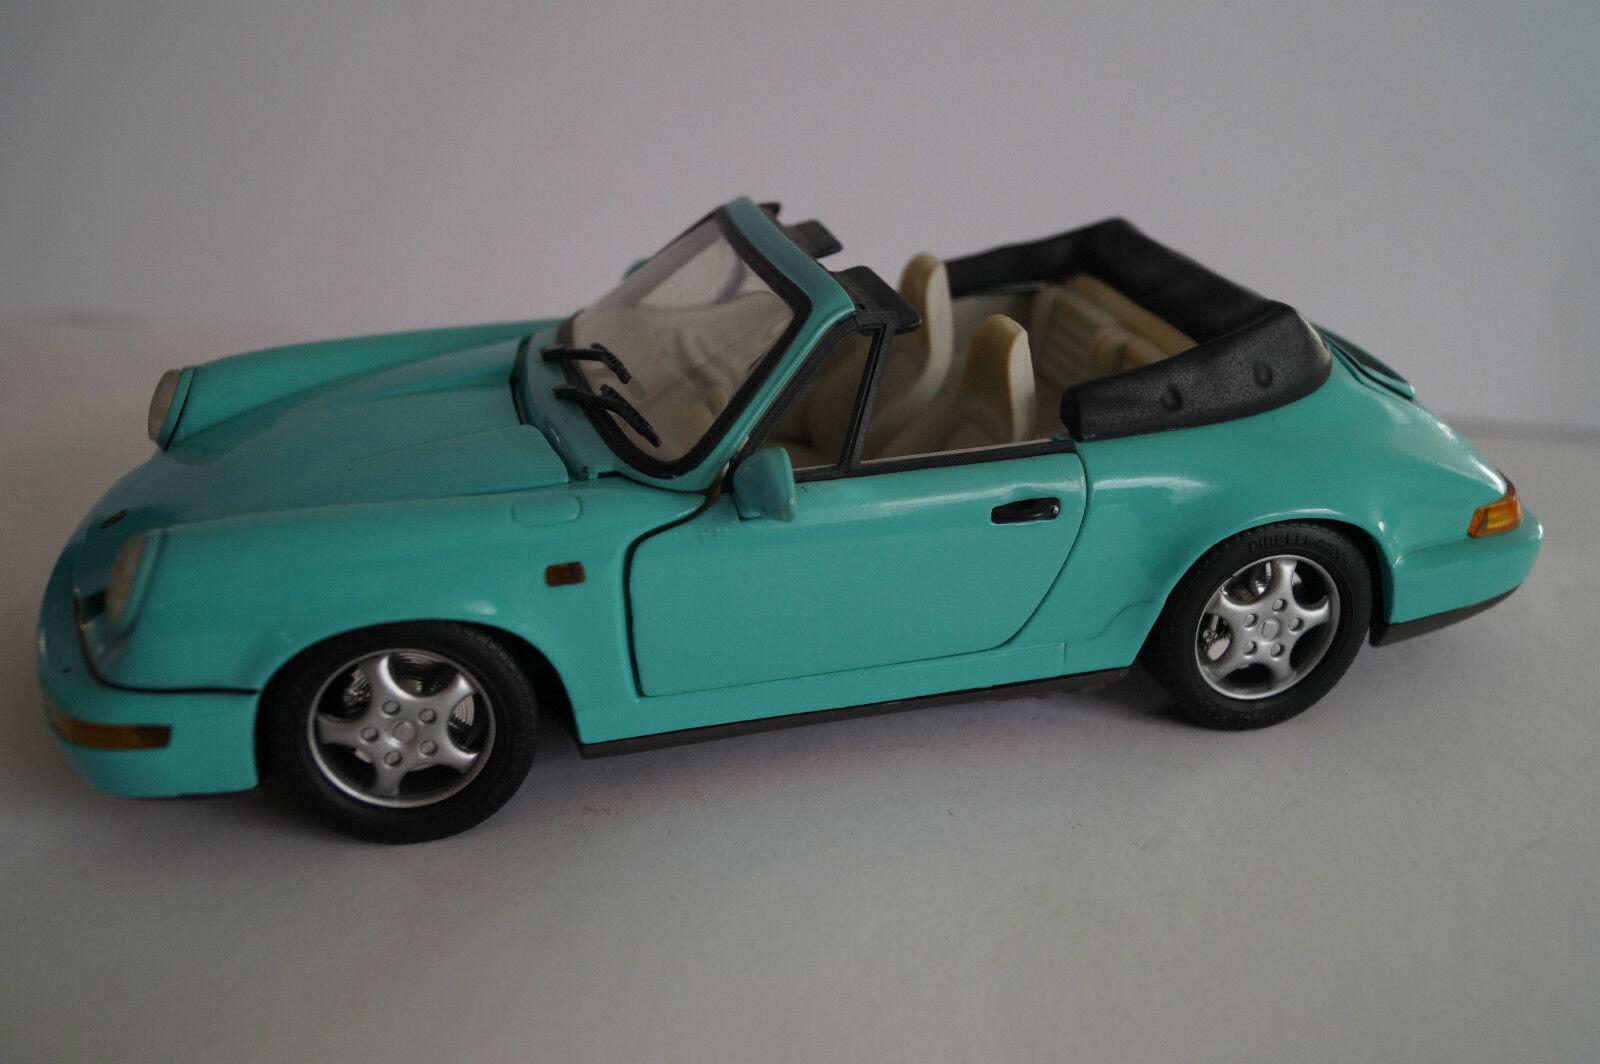 Anson Modellauto 1 18 Porsche 911 Cabriolet